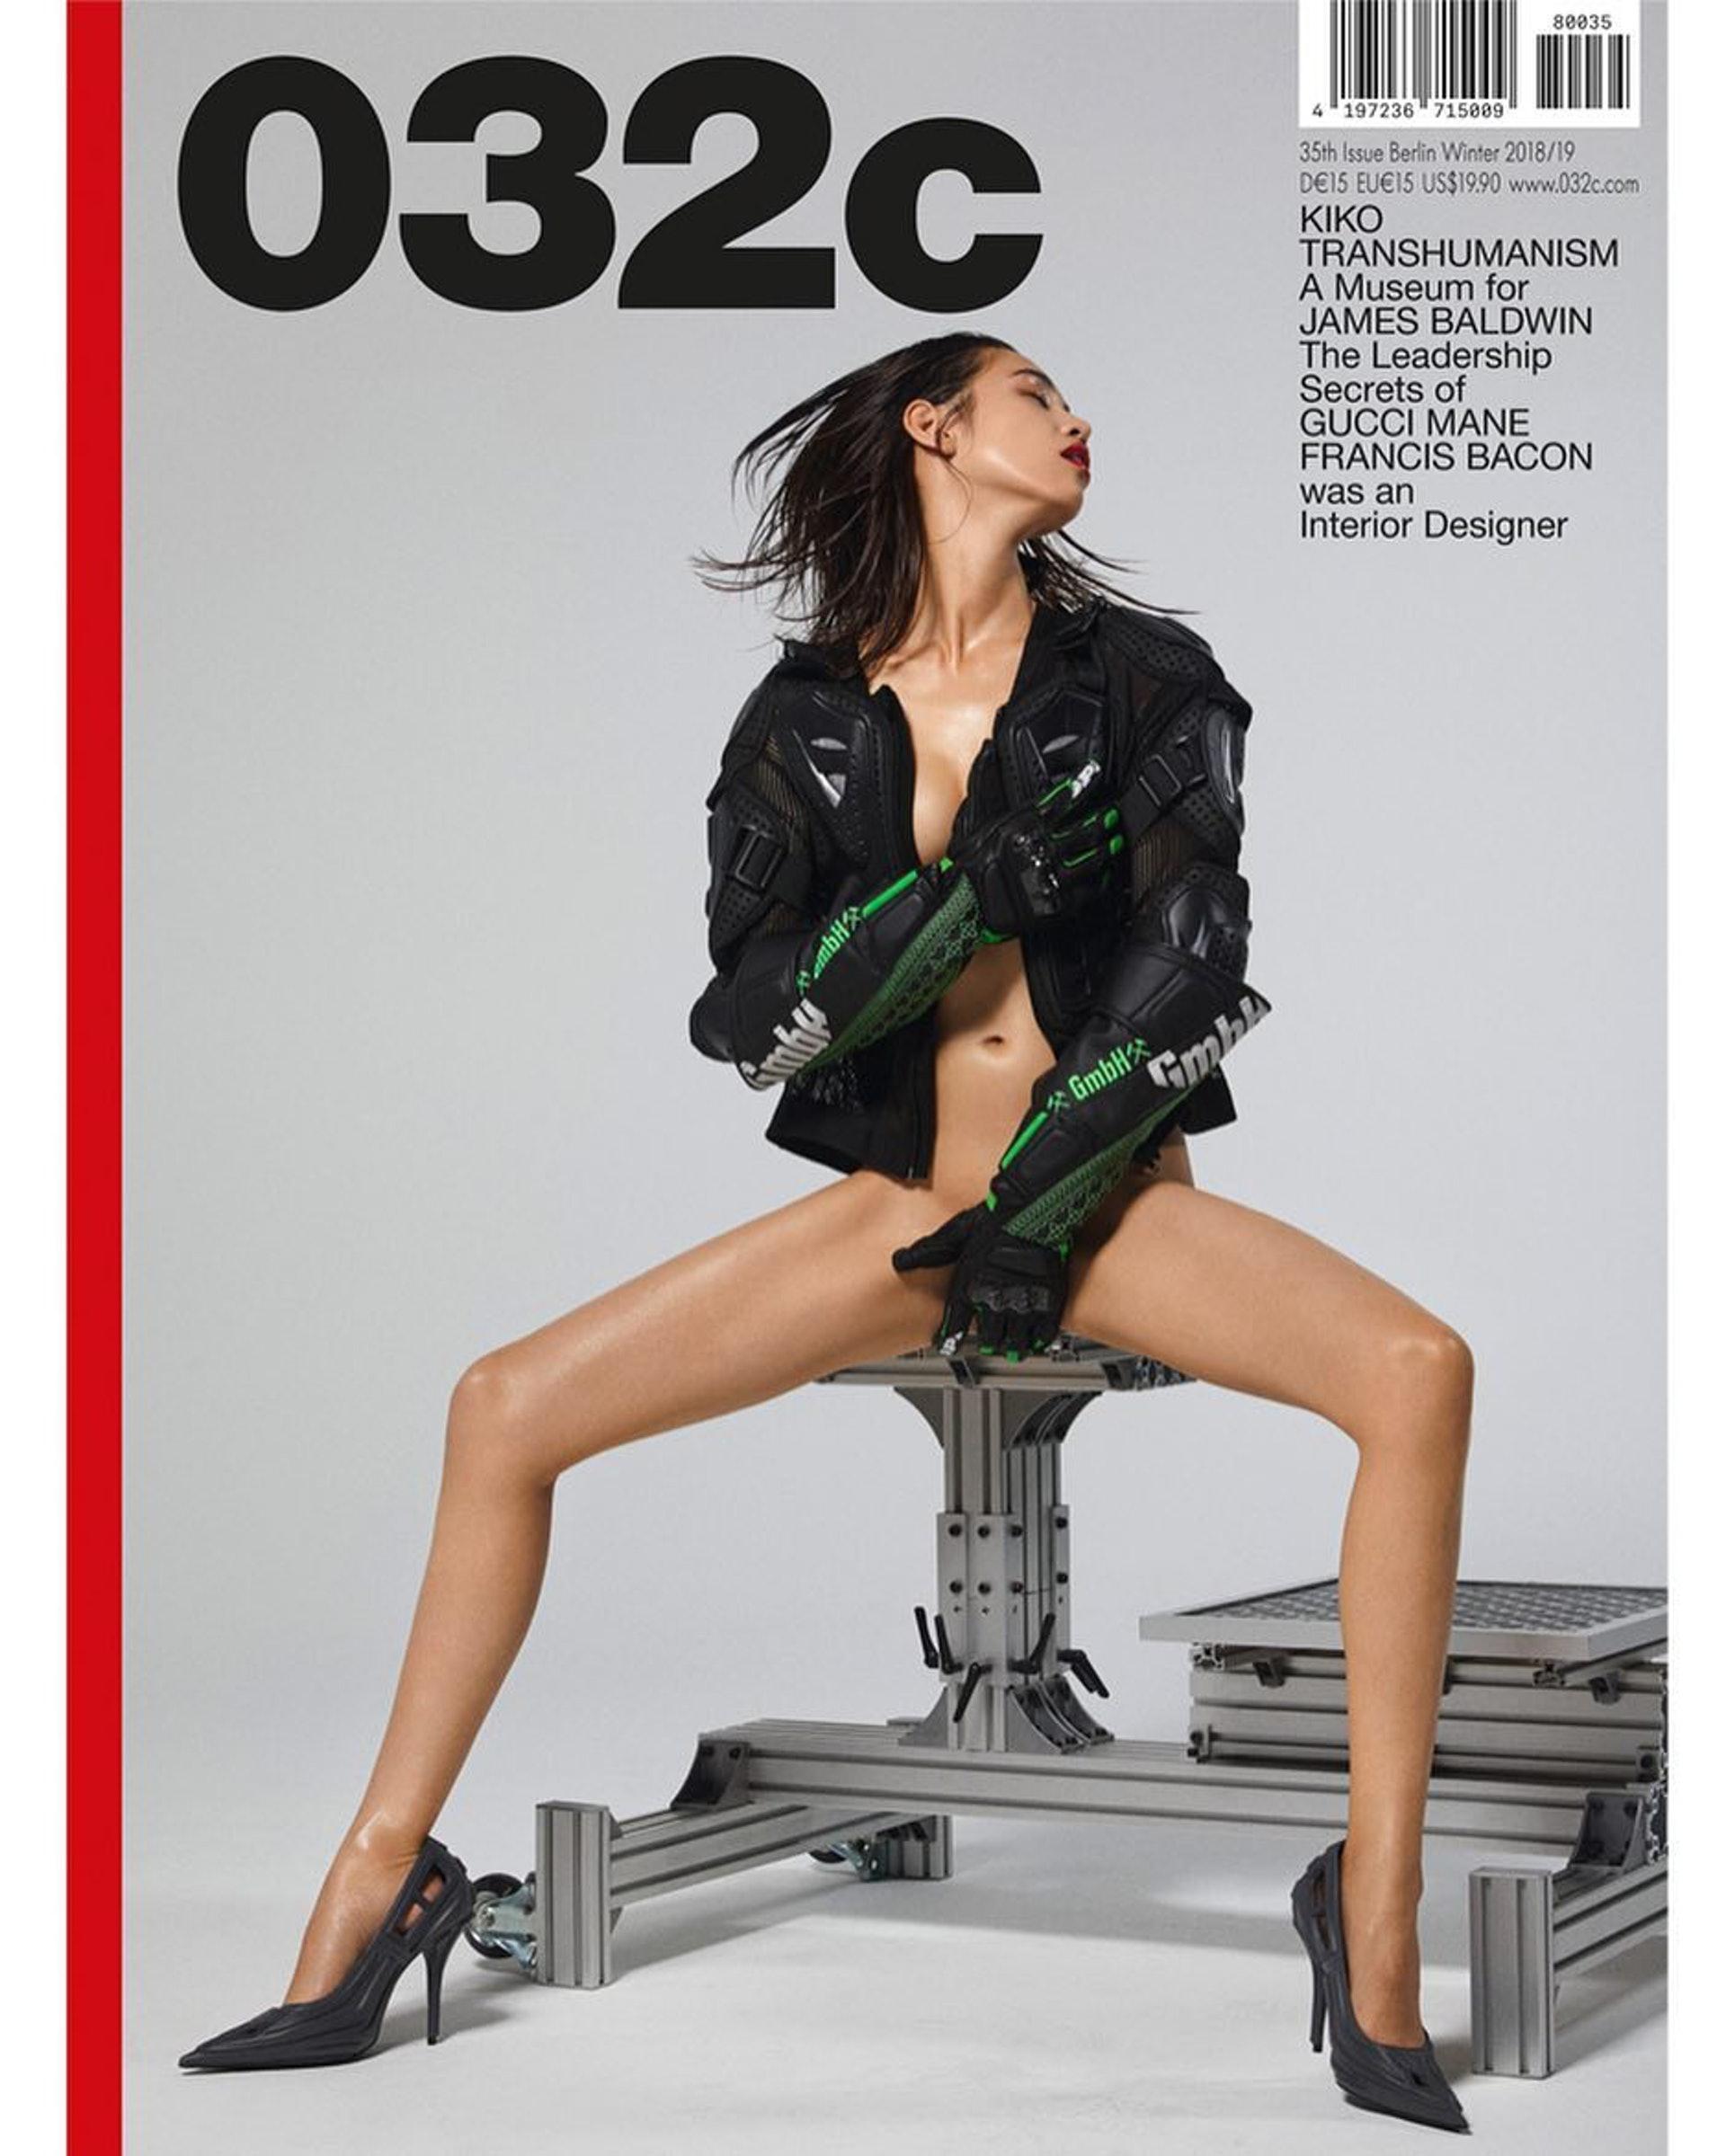 《032c》第三十五期封面。